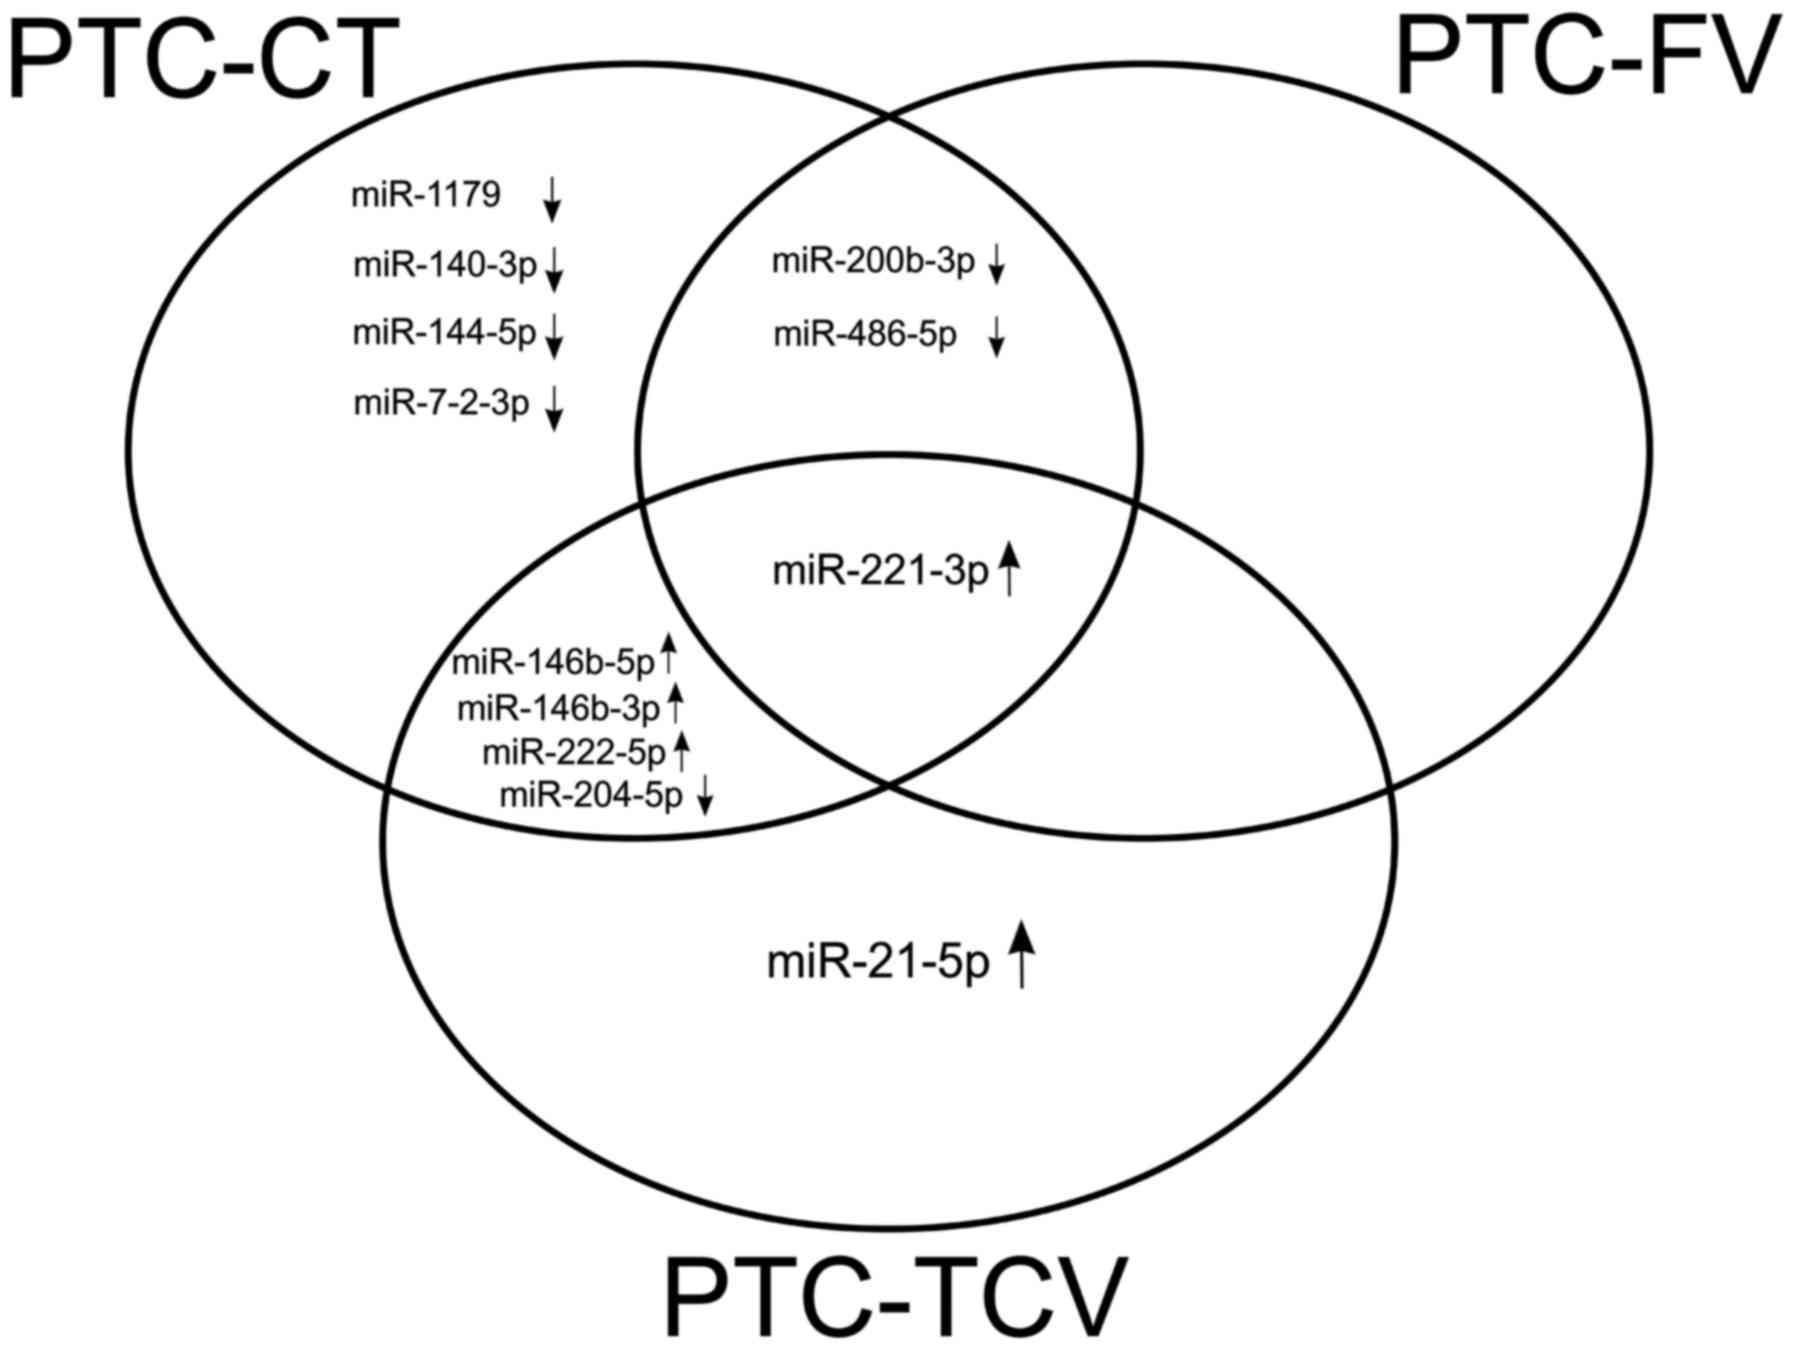 Microrna Based Molecular Classification Of Papillary